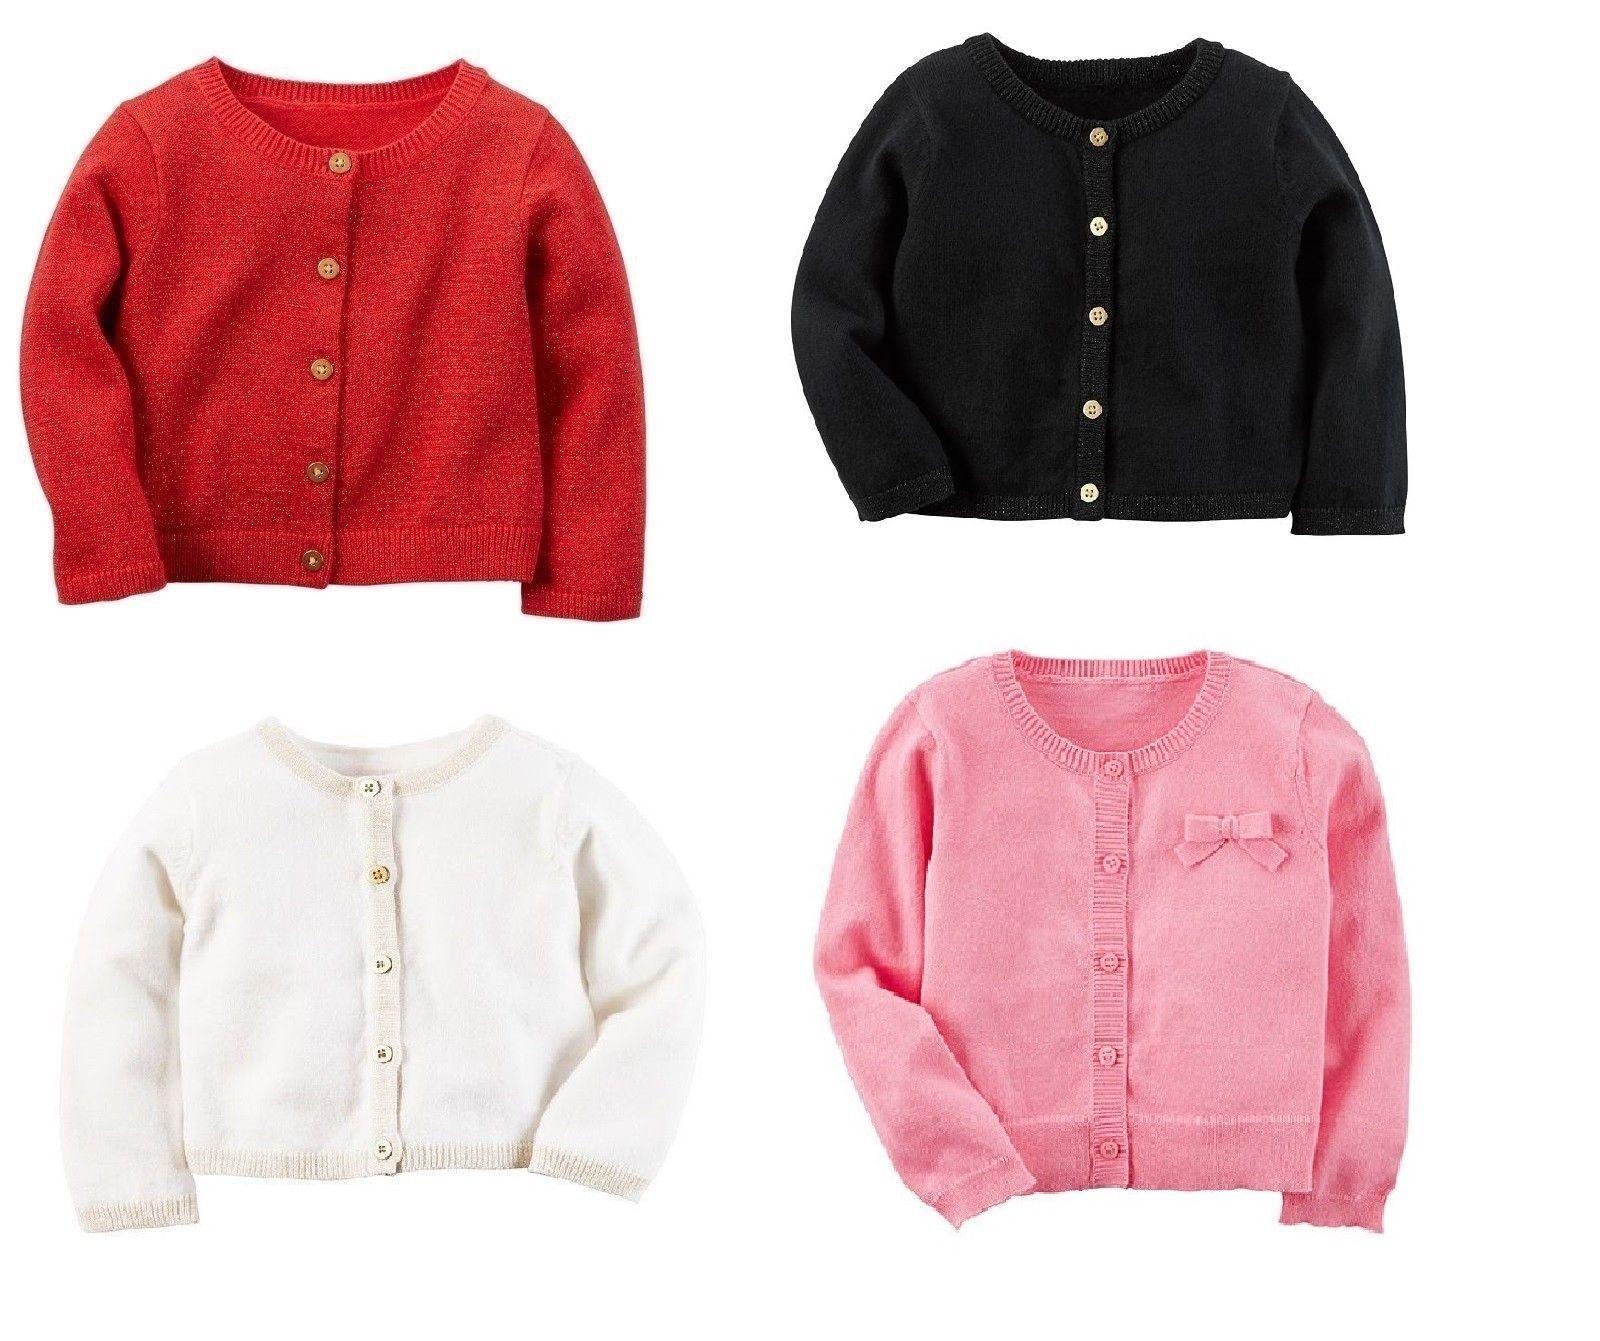 0b0663a1e Sweaters 147216  Nwt Carters Infant Girls Dressy Sparkle Cardigan ...